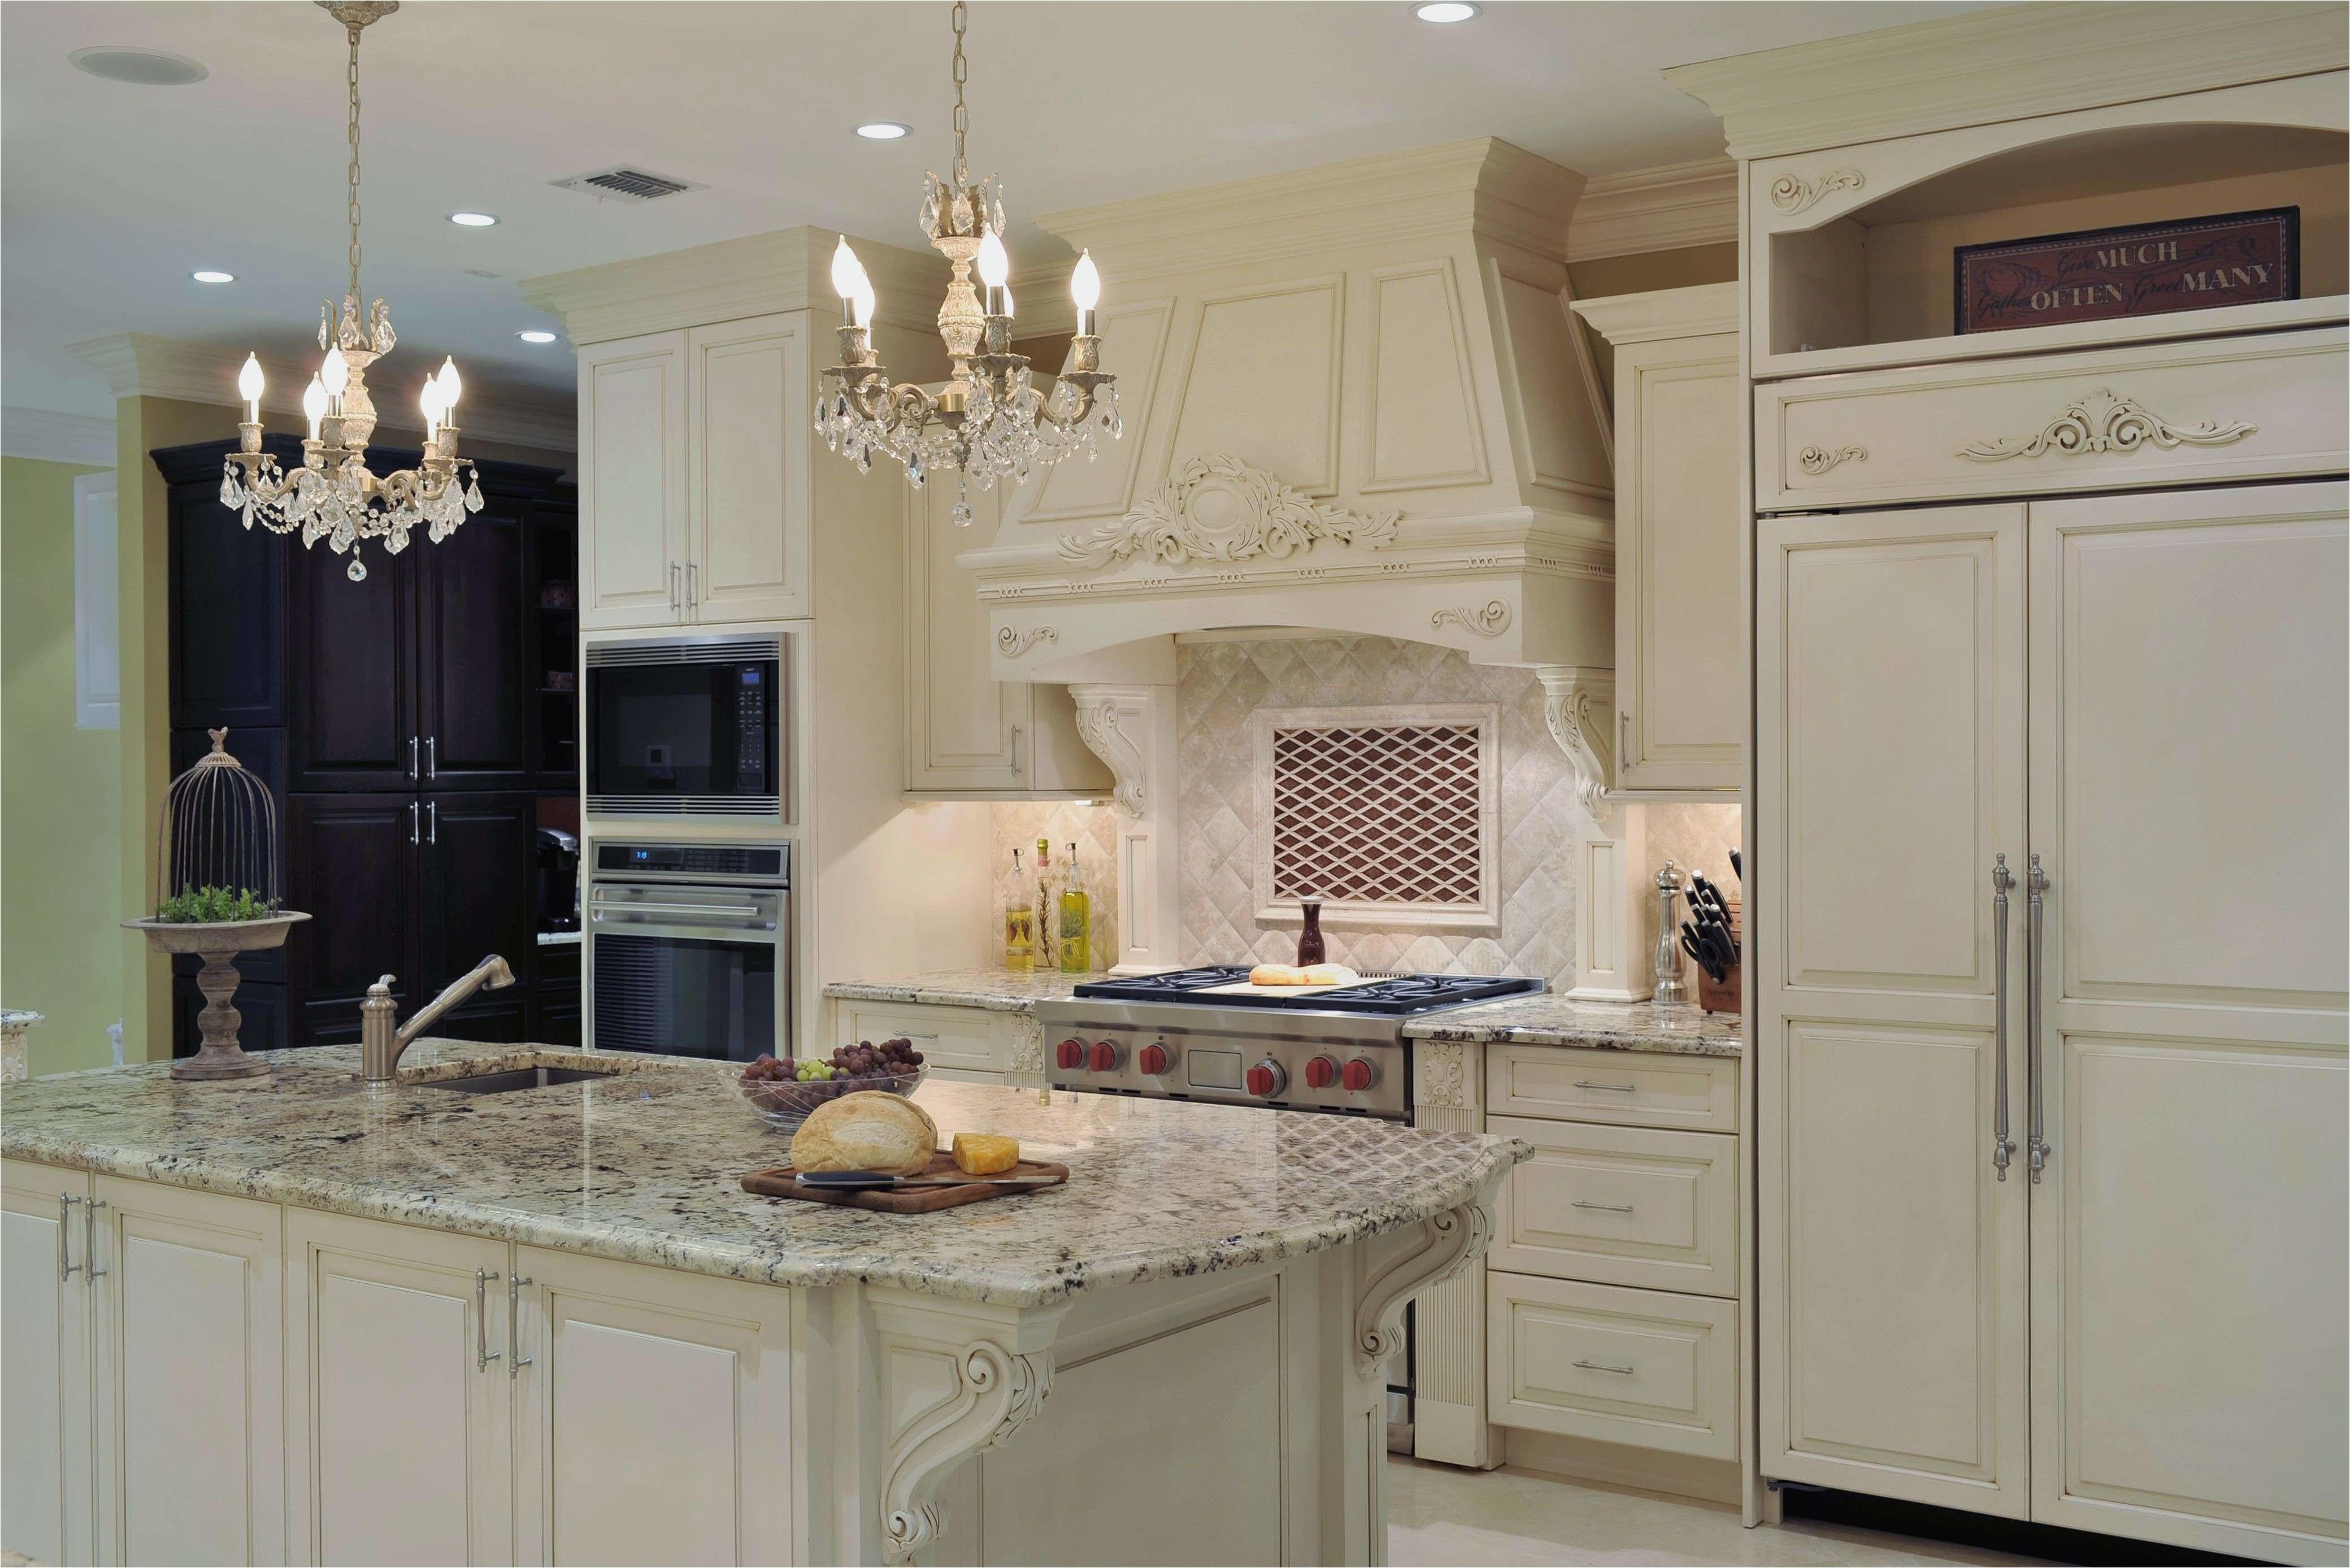 Kitchen Cabinet Styles Kitchen Cabinet Ideas for Small Kitchens Unique Exclusive Kitchen